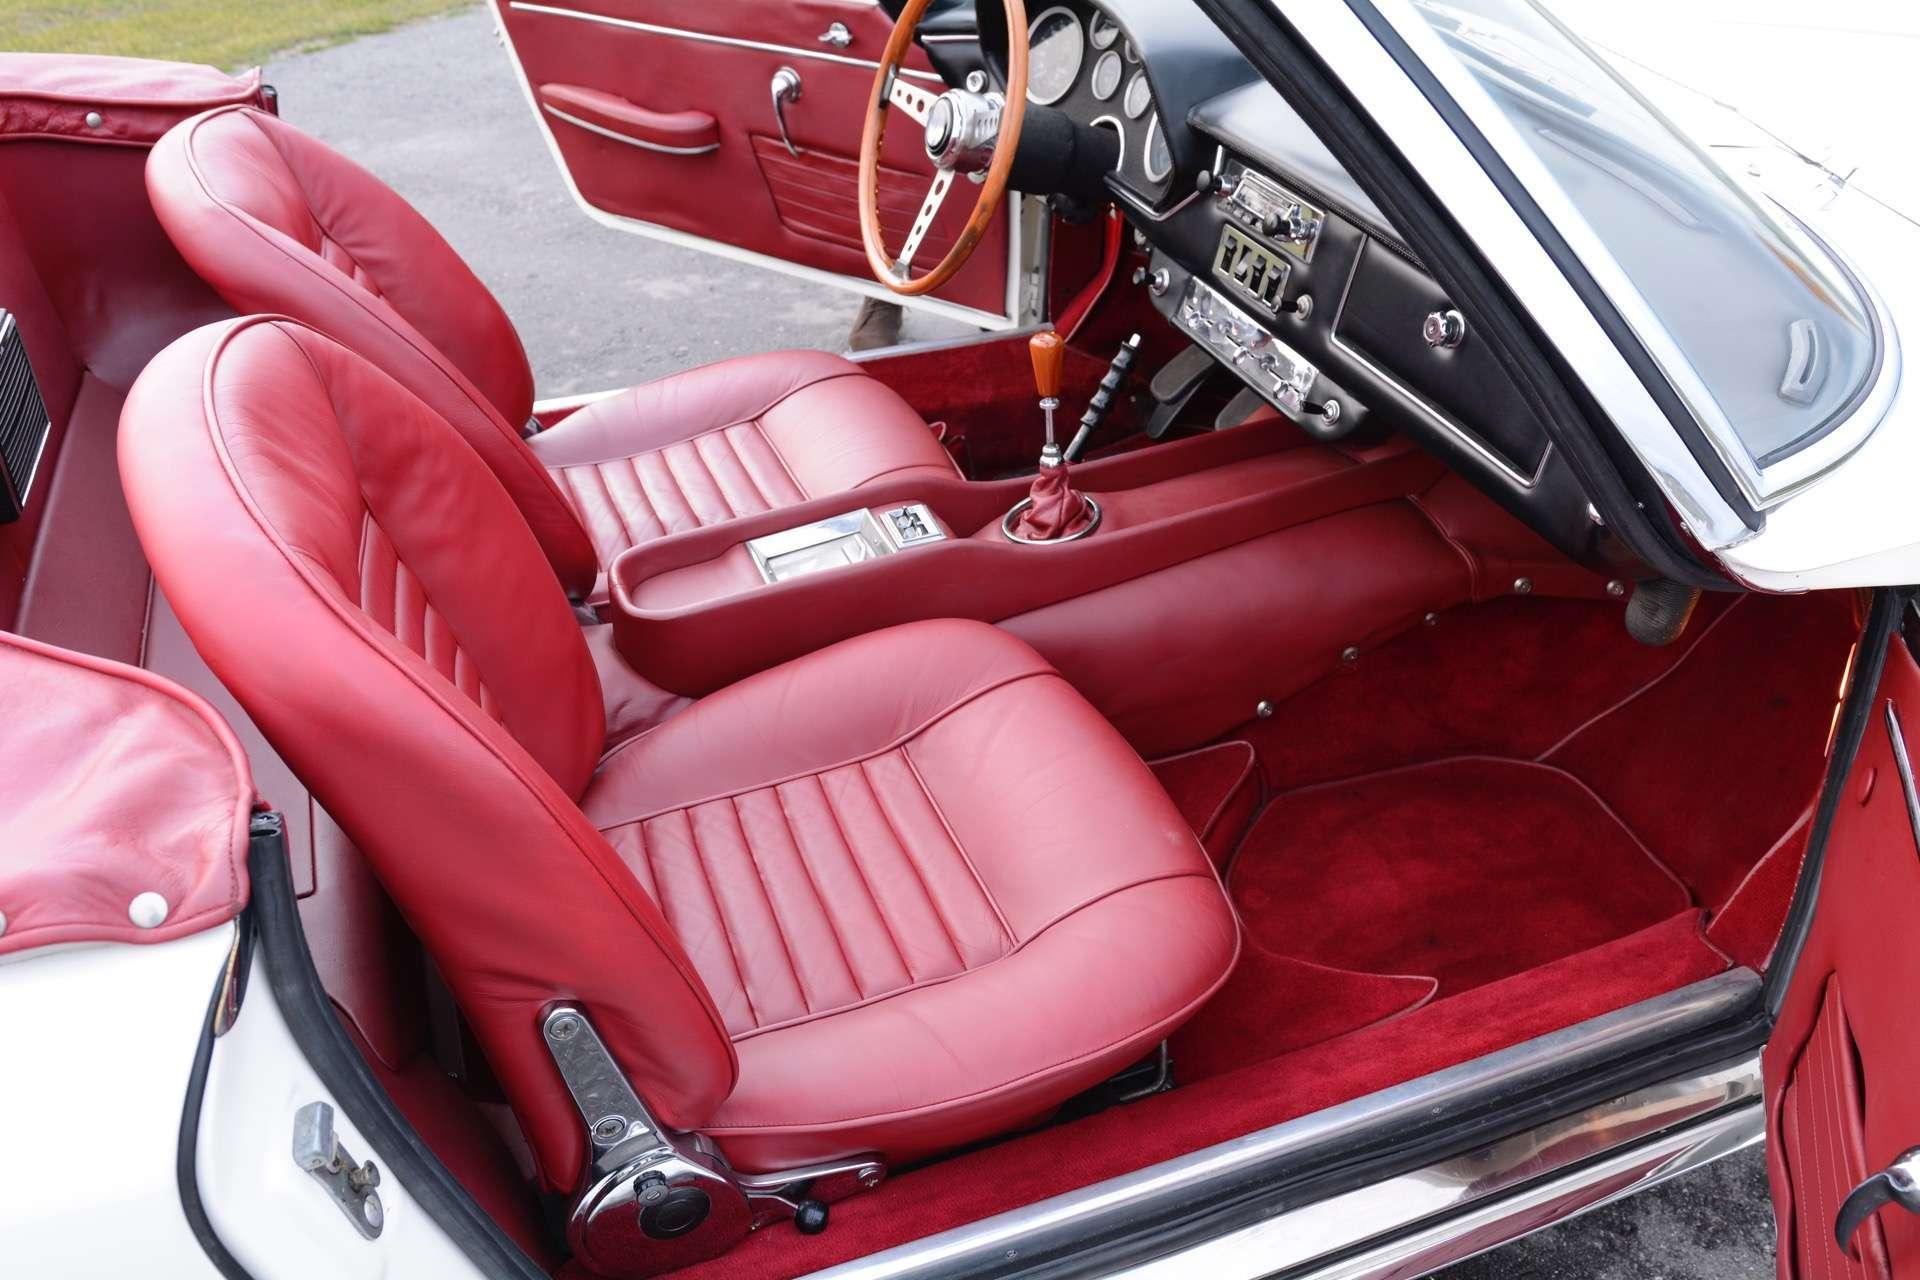 Maserati Mistral 4000 Spyder 1967